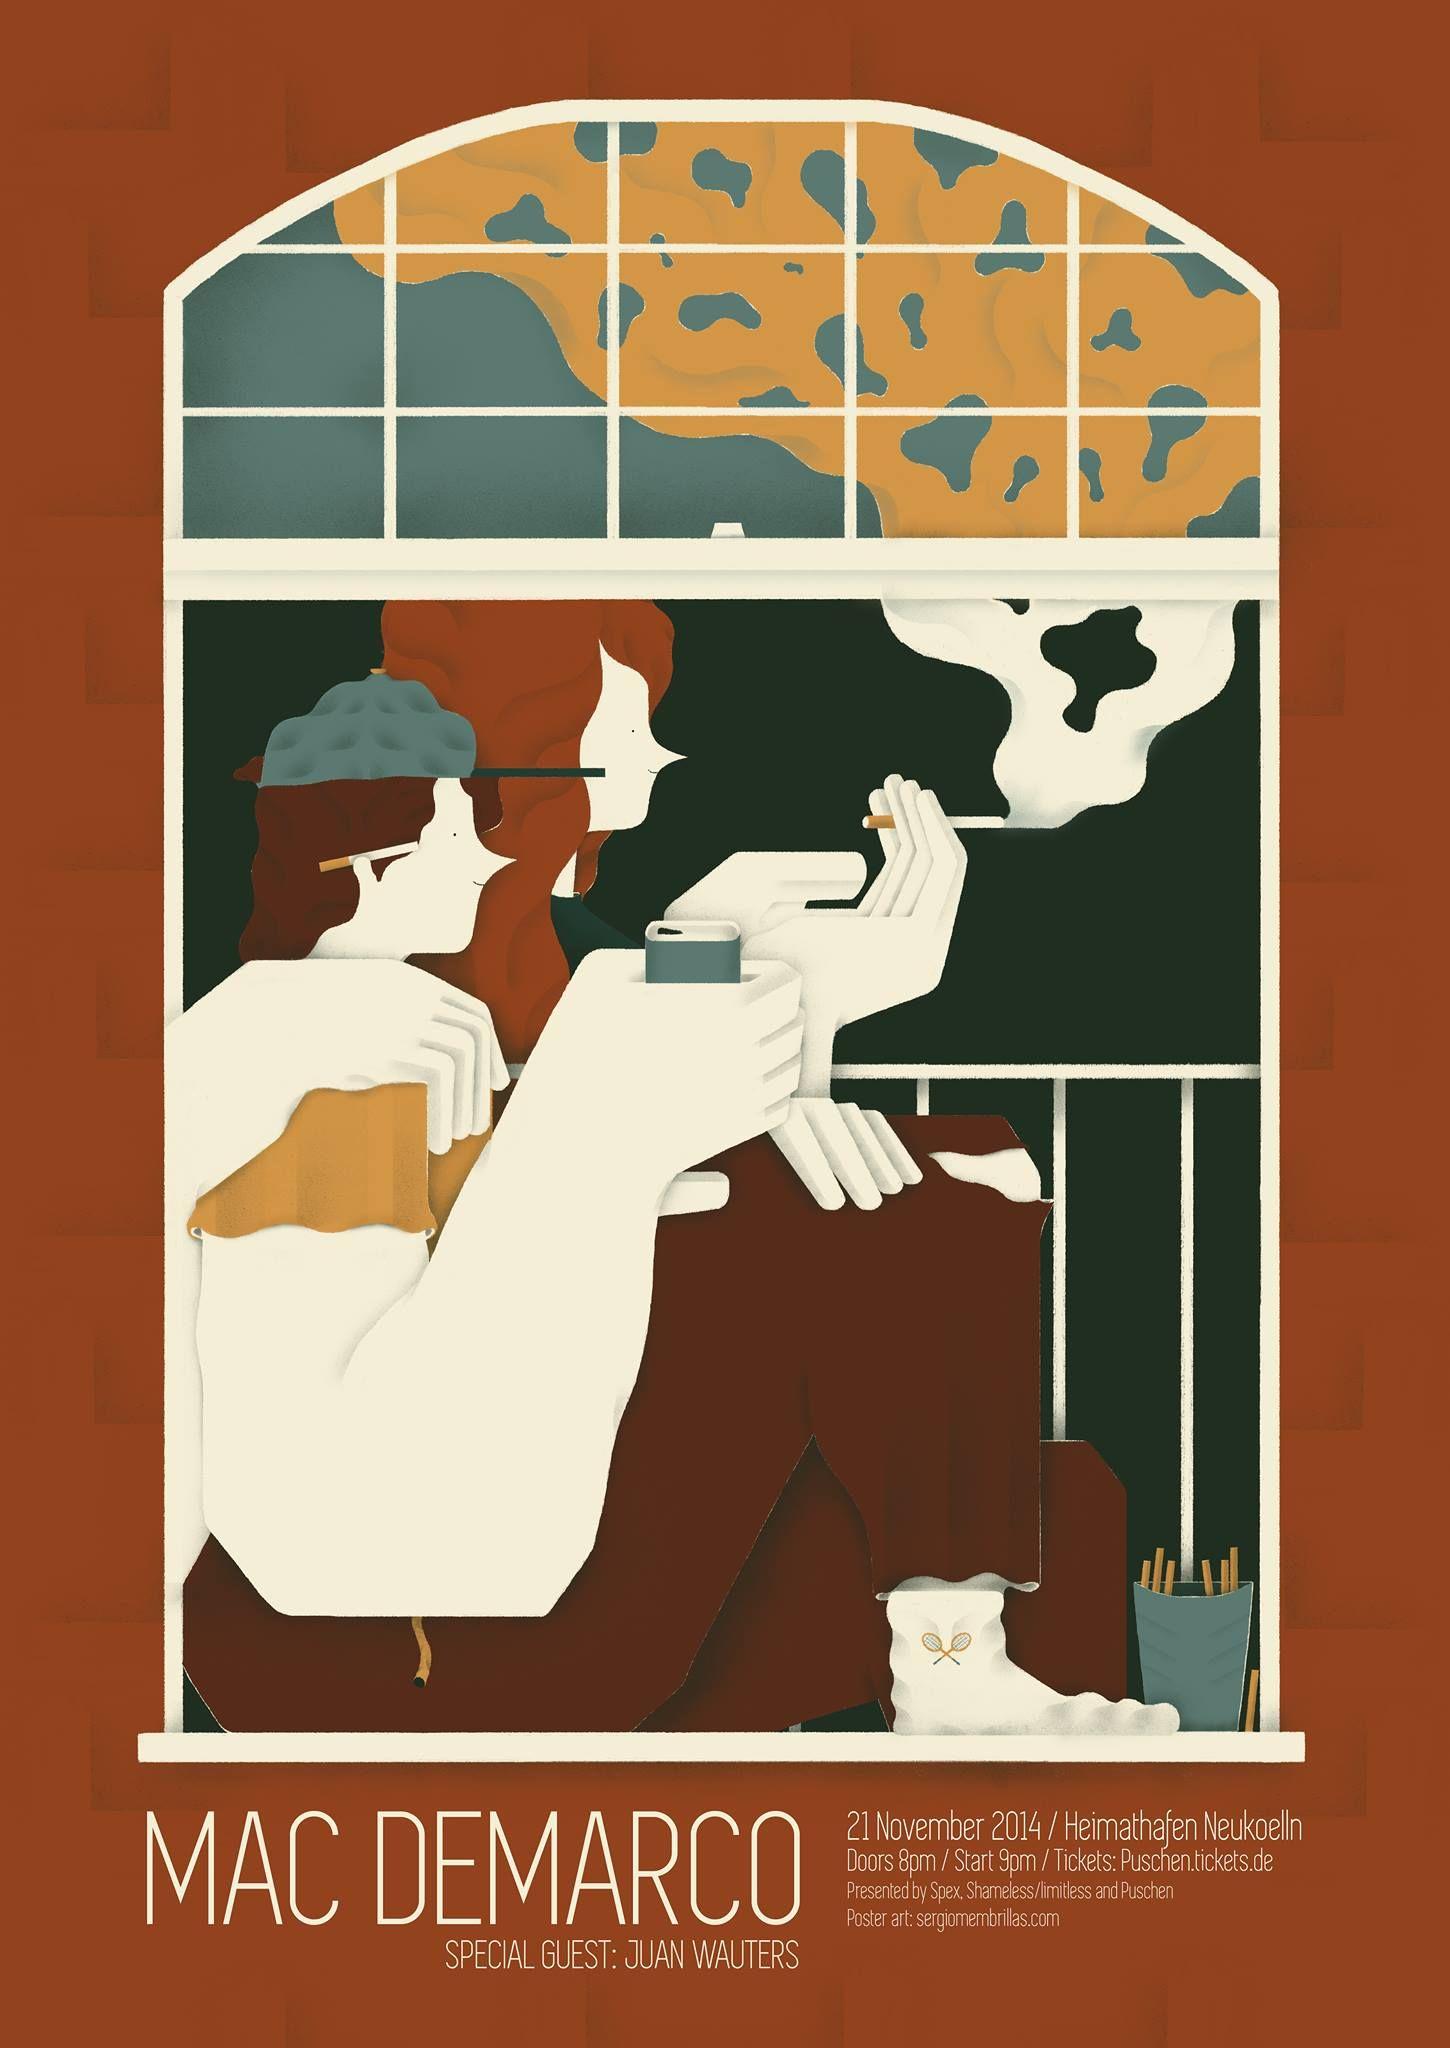 mac de marco | illustration | Pinterest | Mac, Marcos y De banda